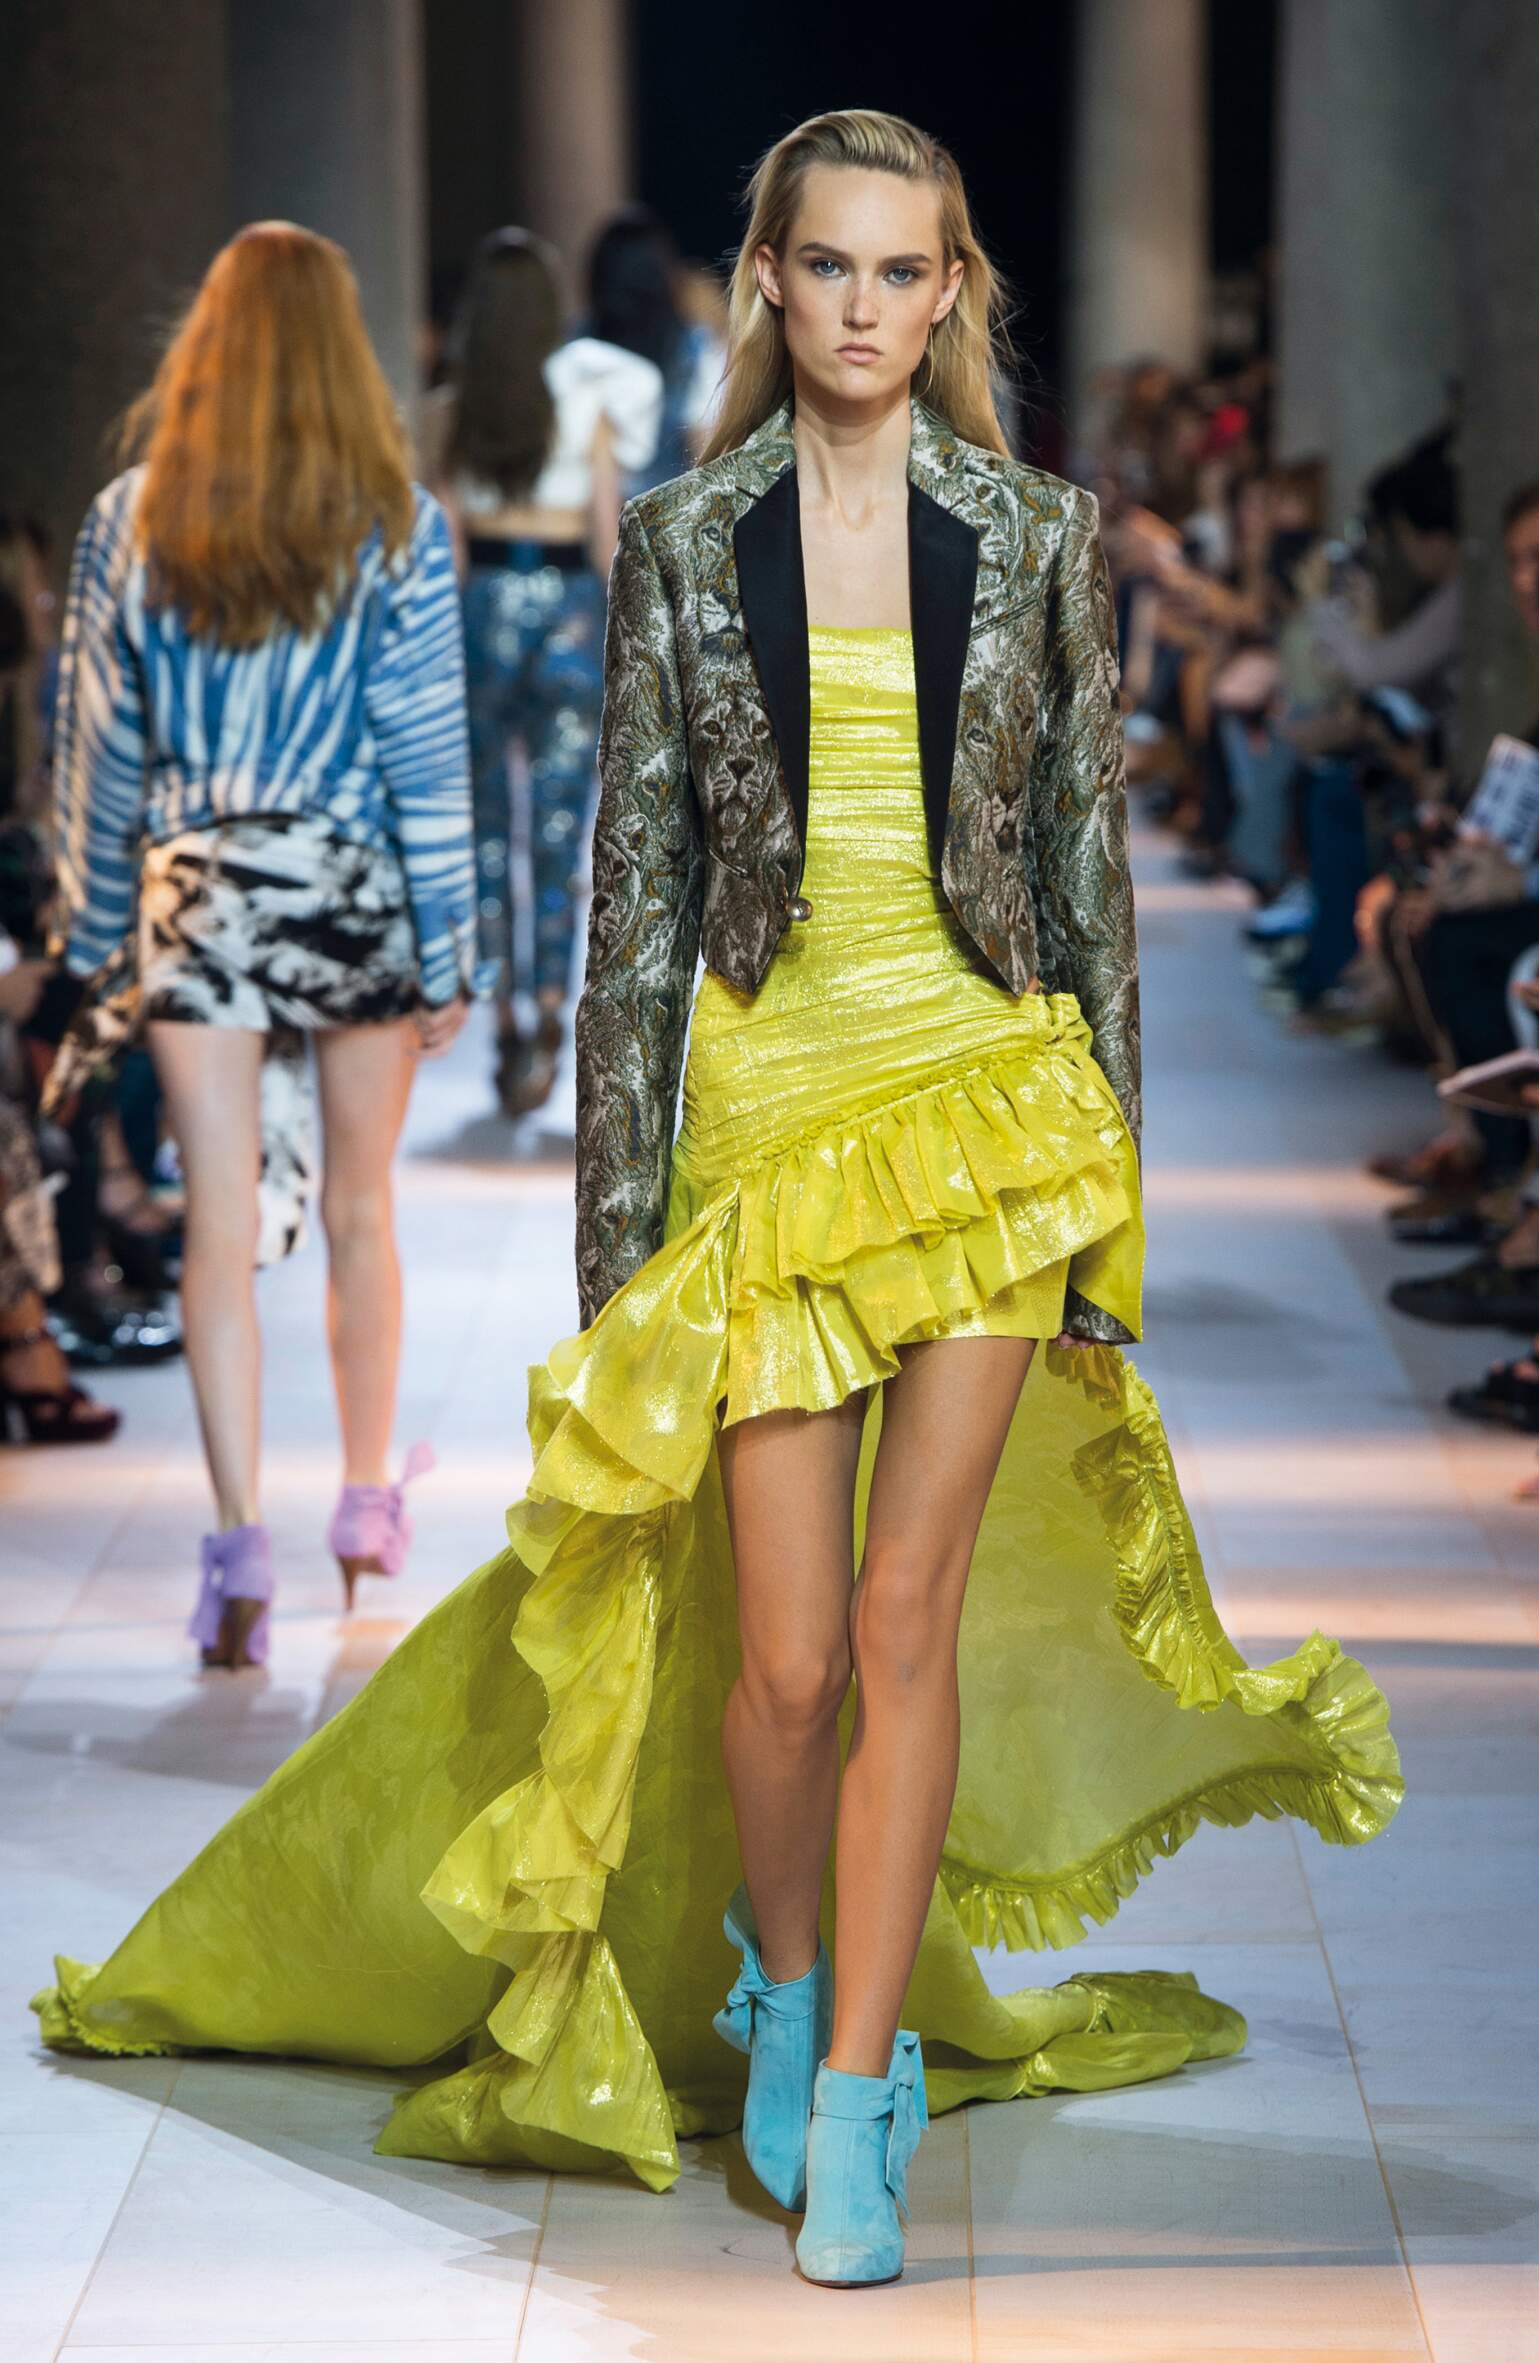 Roberto Cavalli SS 2016 Womenswear